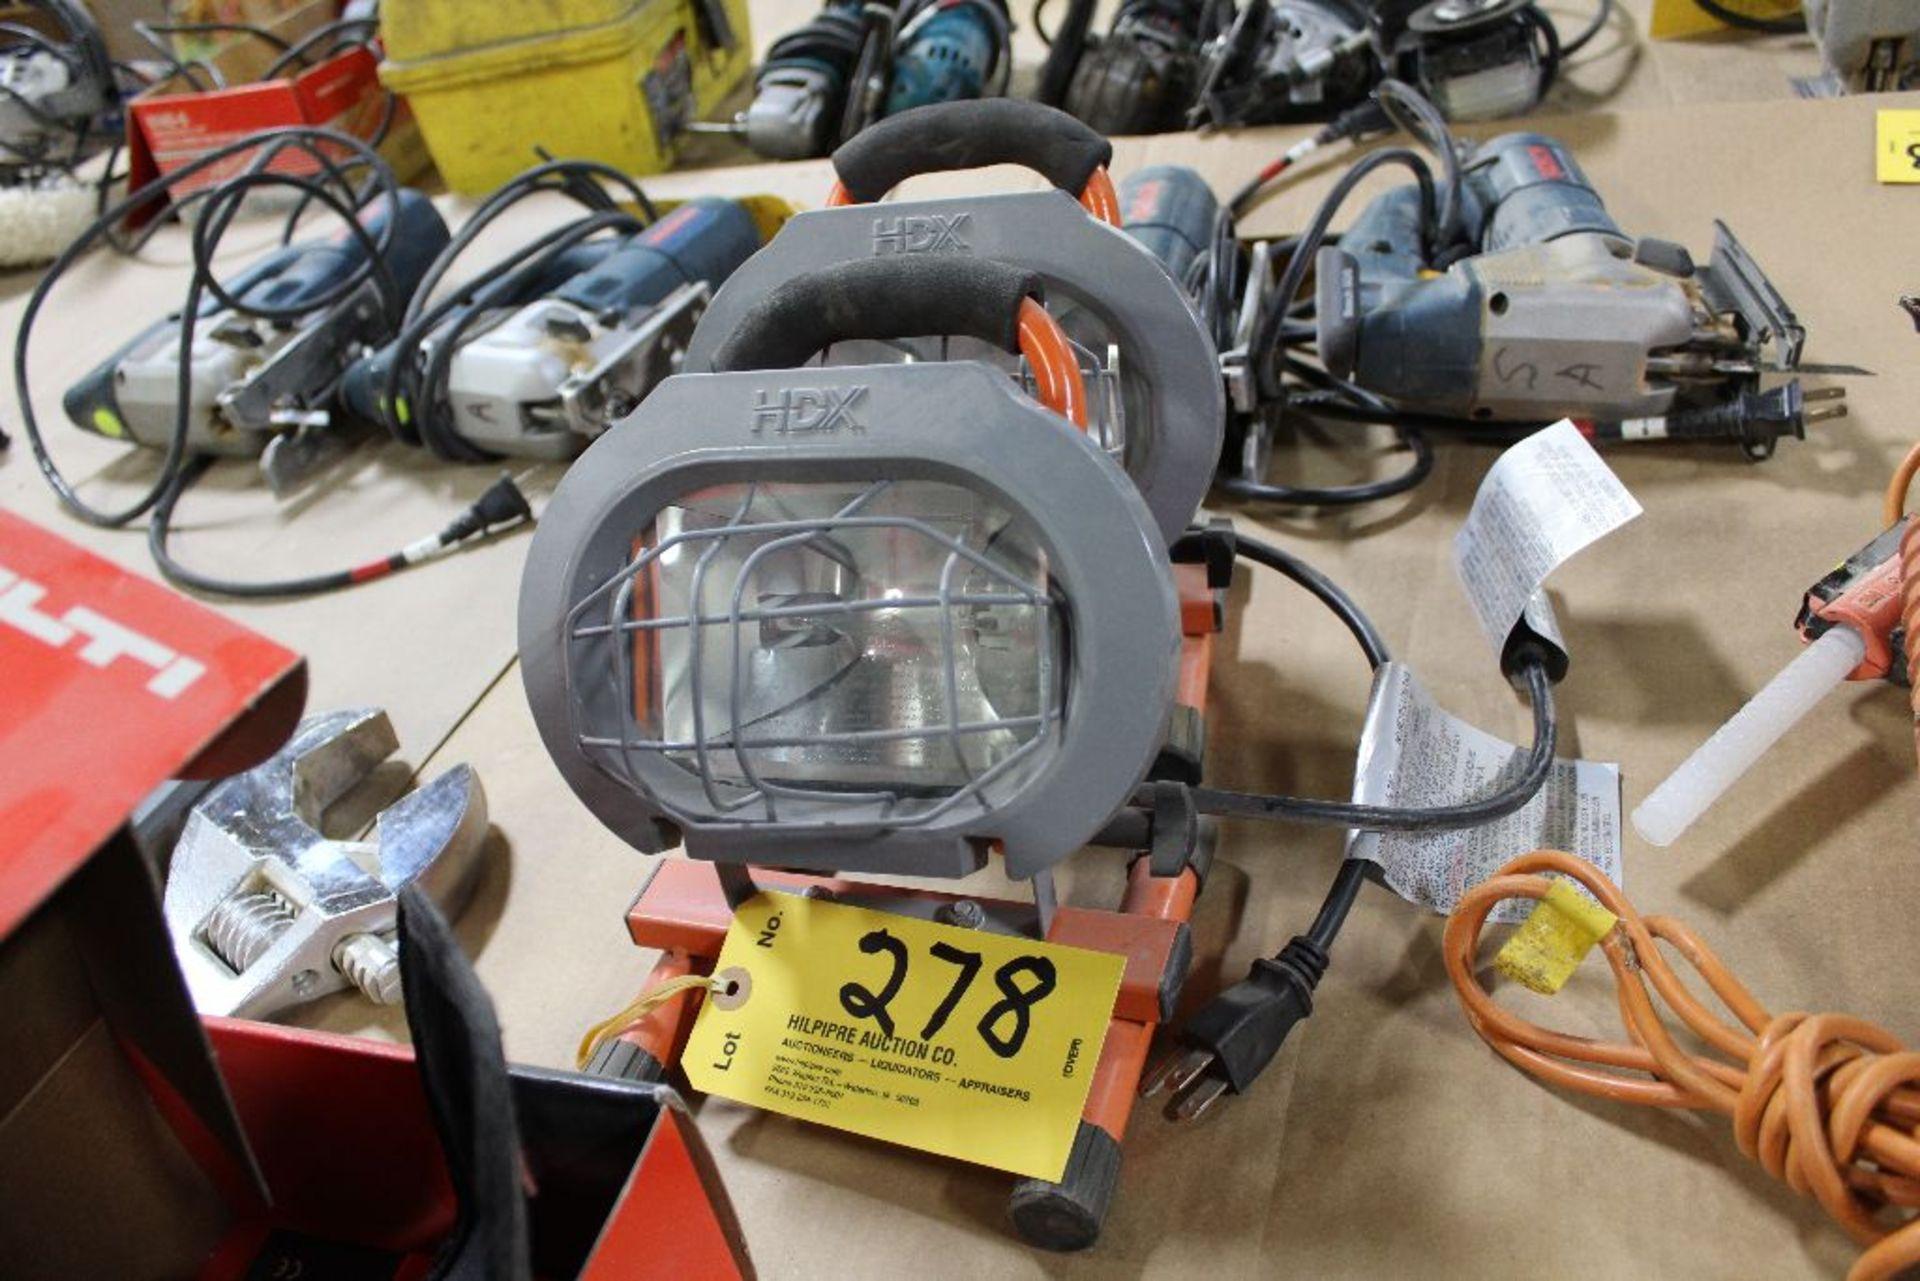 Lot 278 - HDS work lights (2).